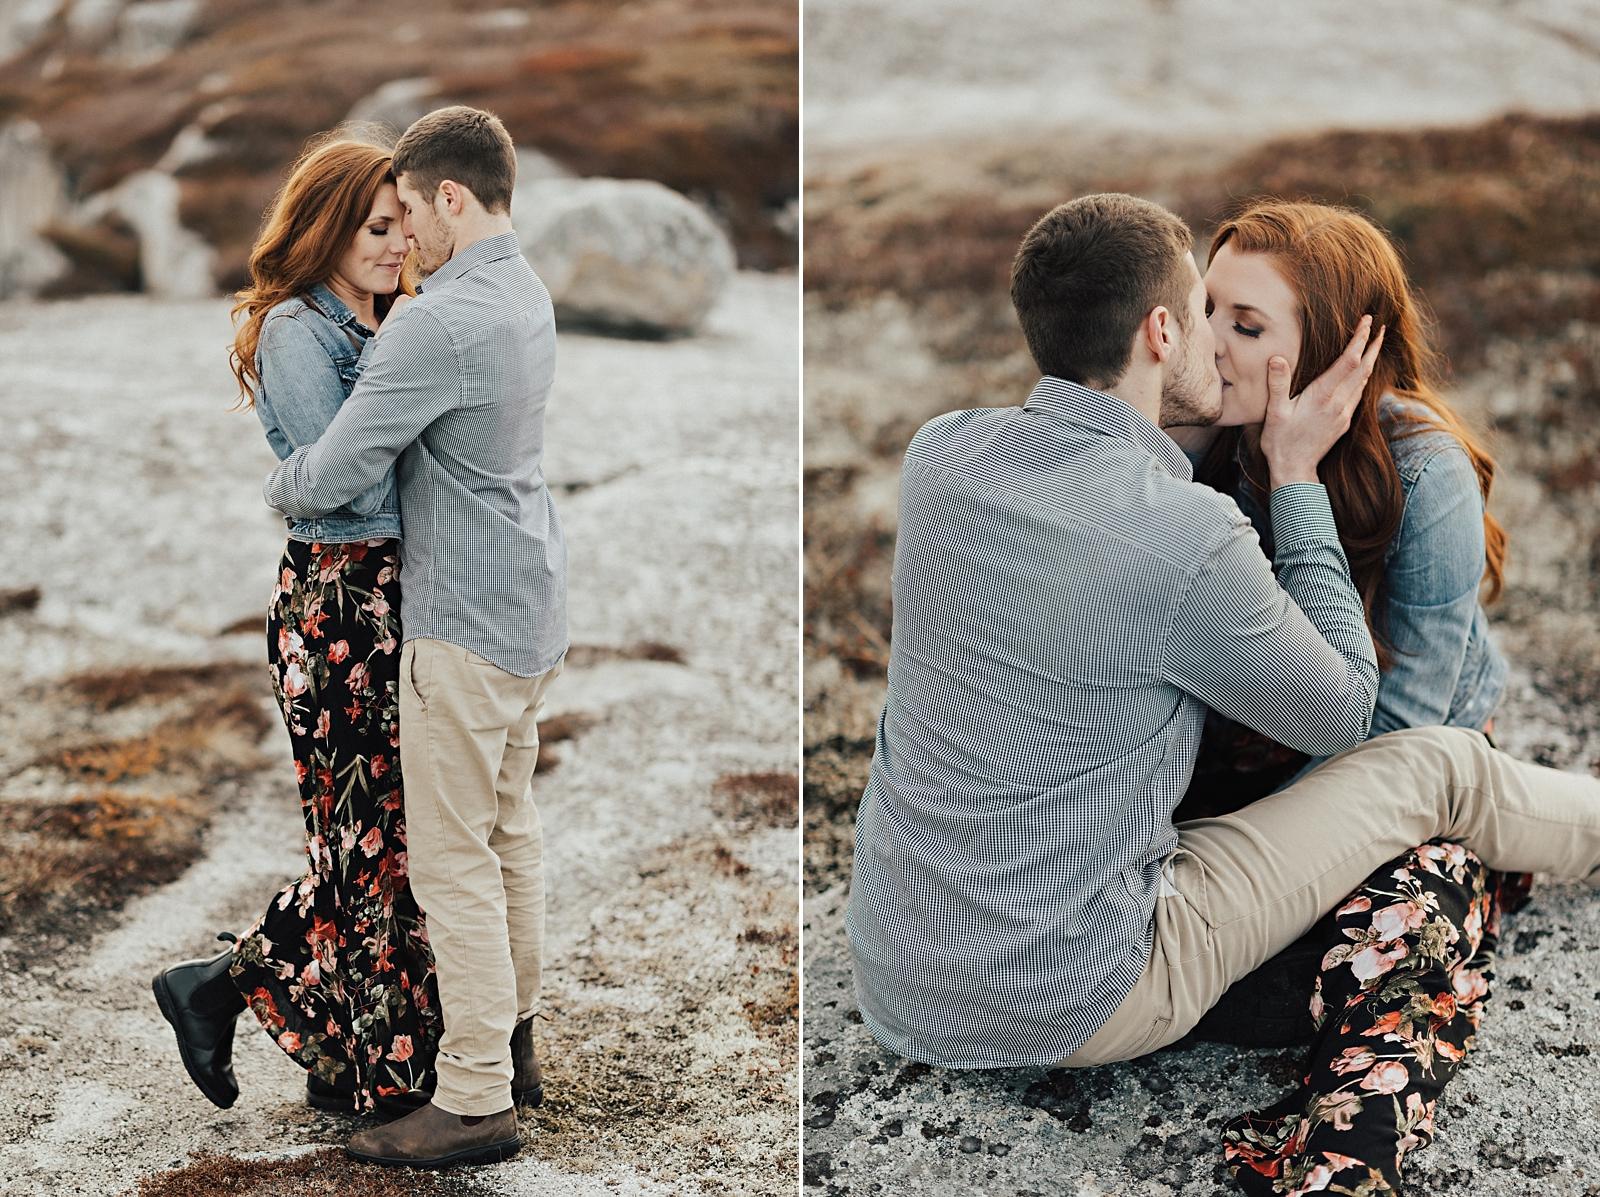 Halifax-Wedding-Photographer_Annie&Ryan_Ocean-Engagement-Shoot_26.jpg